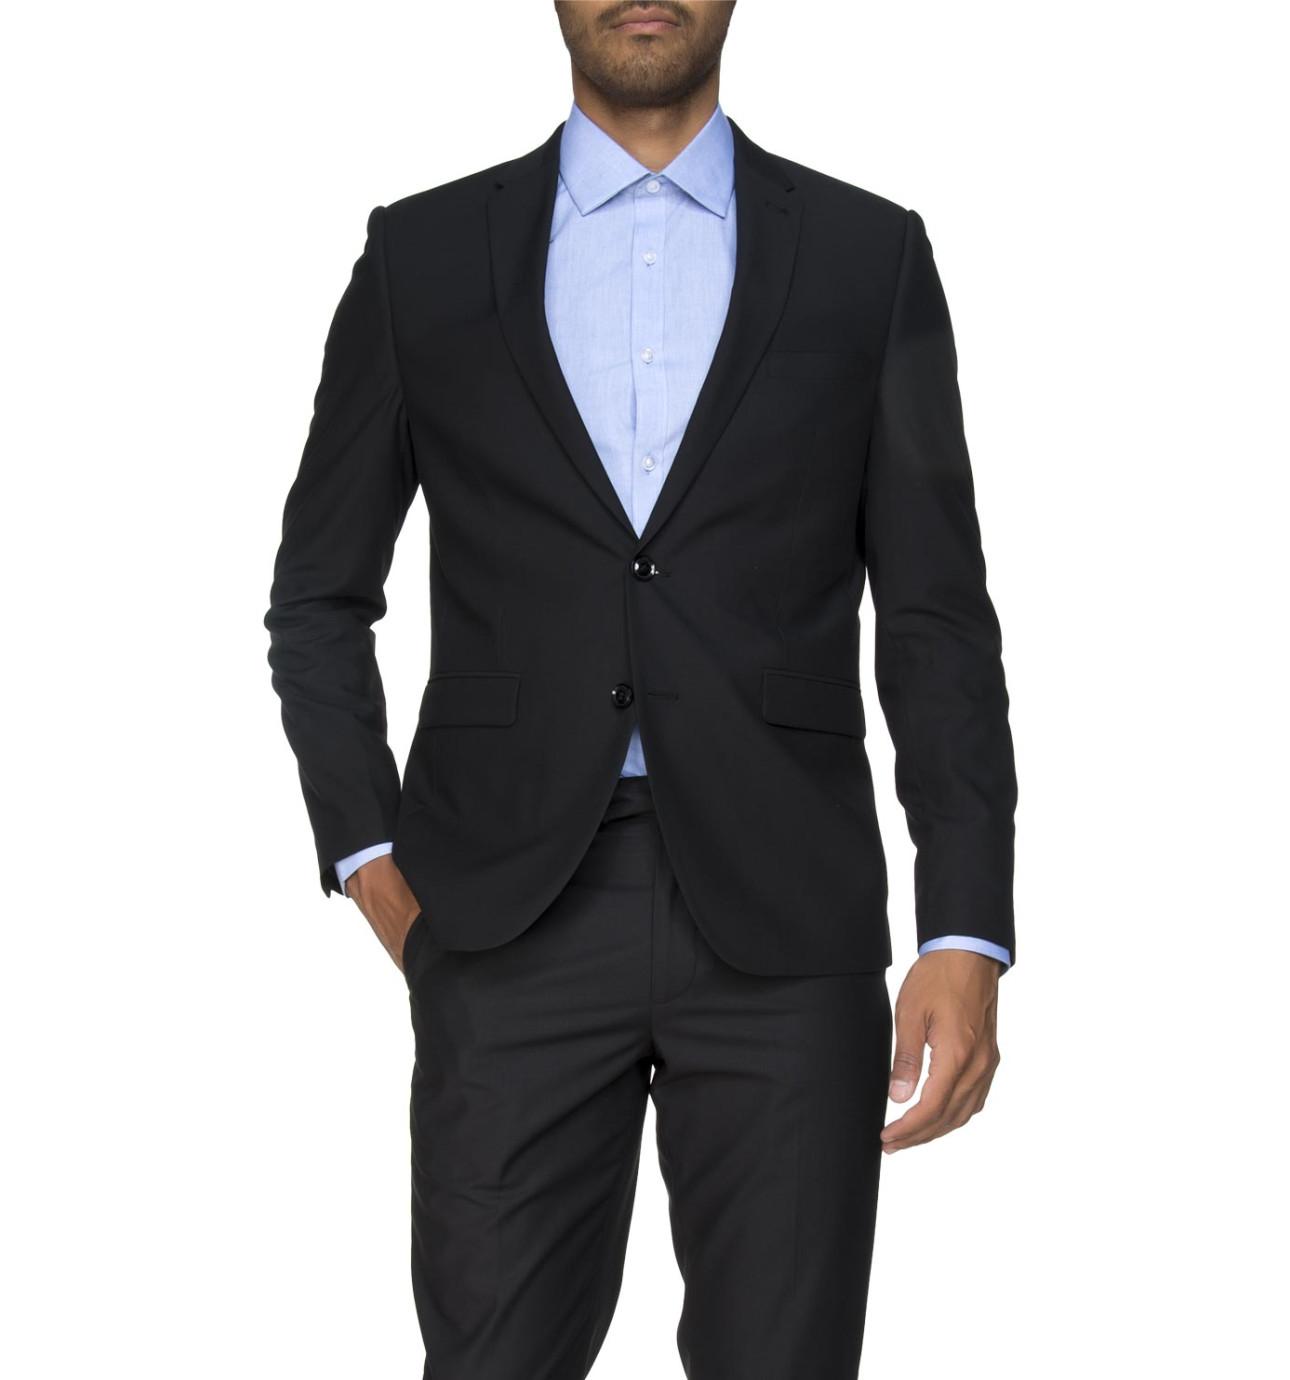 Mens jacket david jones - Polyviscose Suit Jacket